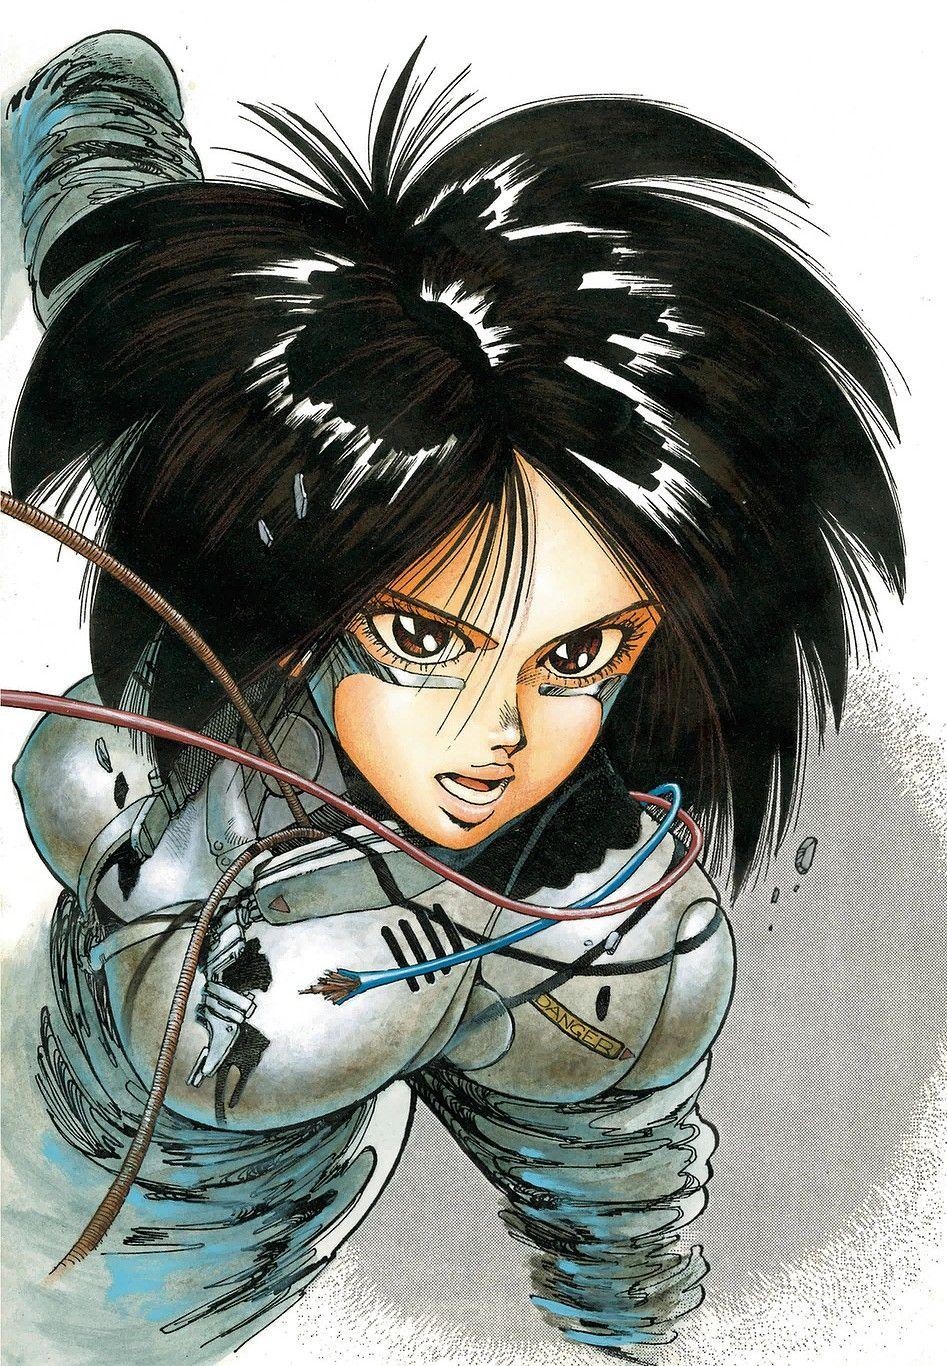 Pin by Rachel Nethaway on Anime etc. Alita battle angel